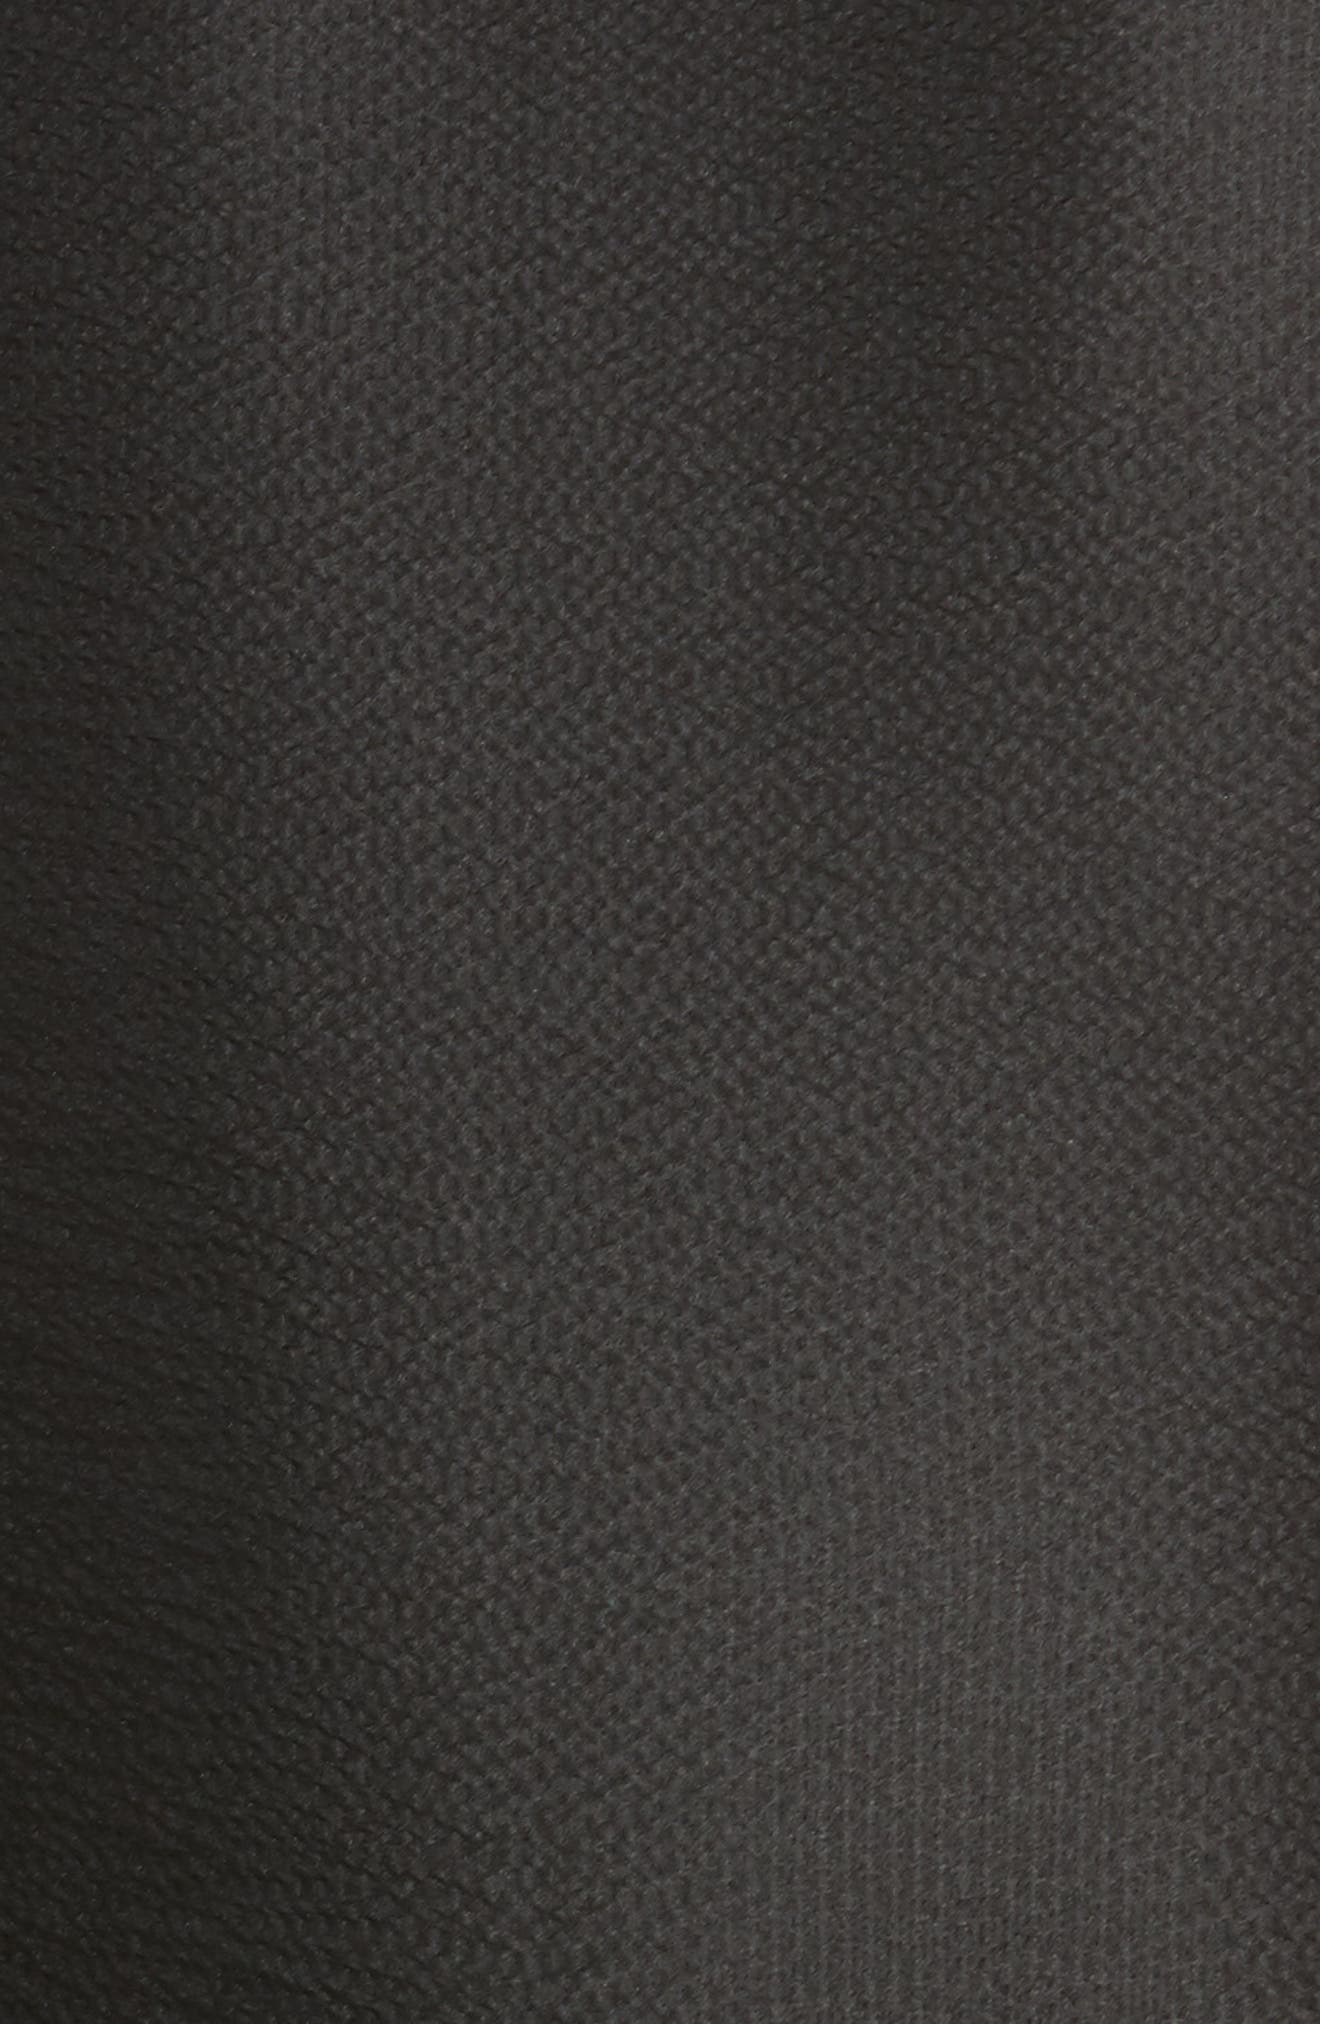 Chelsea Silk Cape Scarf,                             Alternate thumbnail 6, color,                             Black